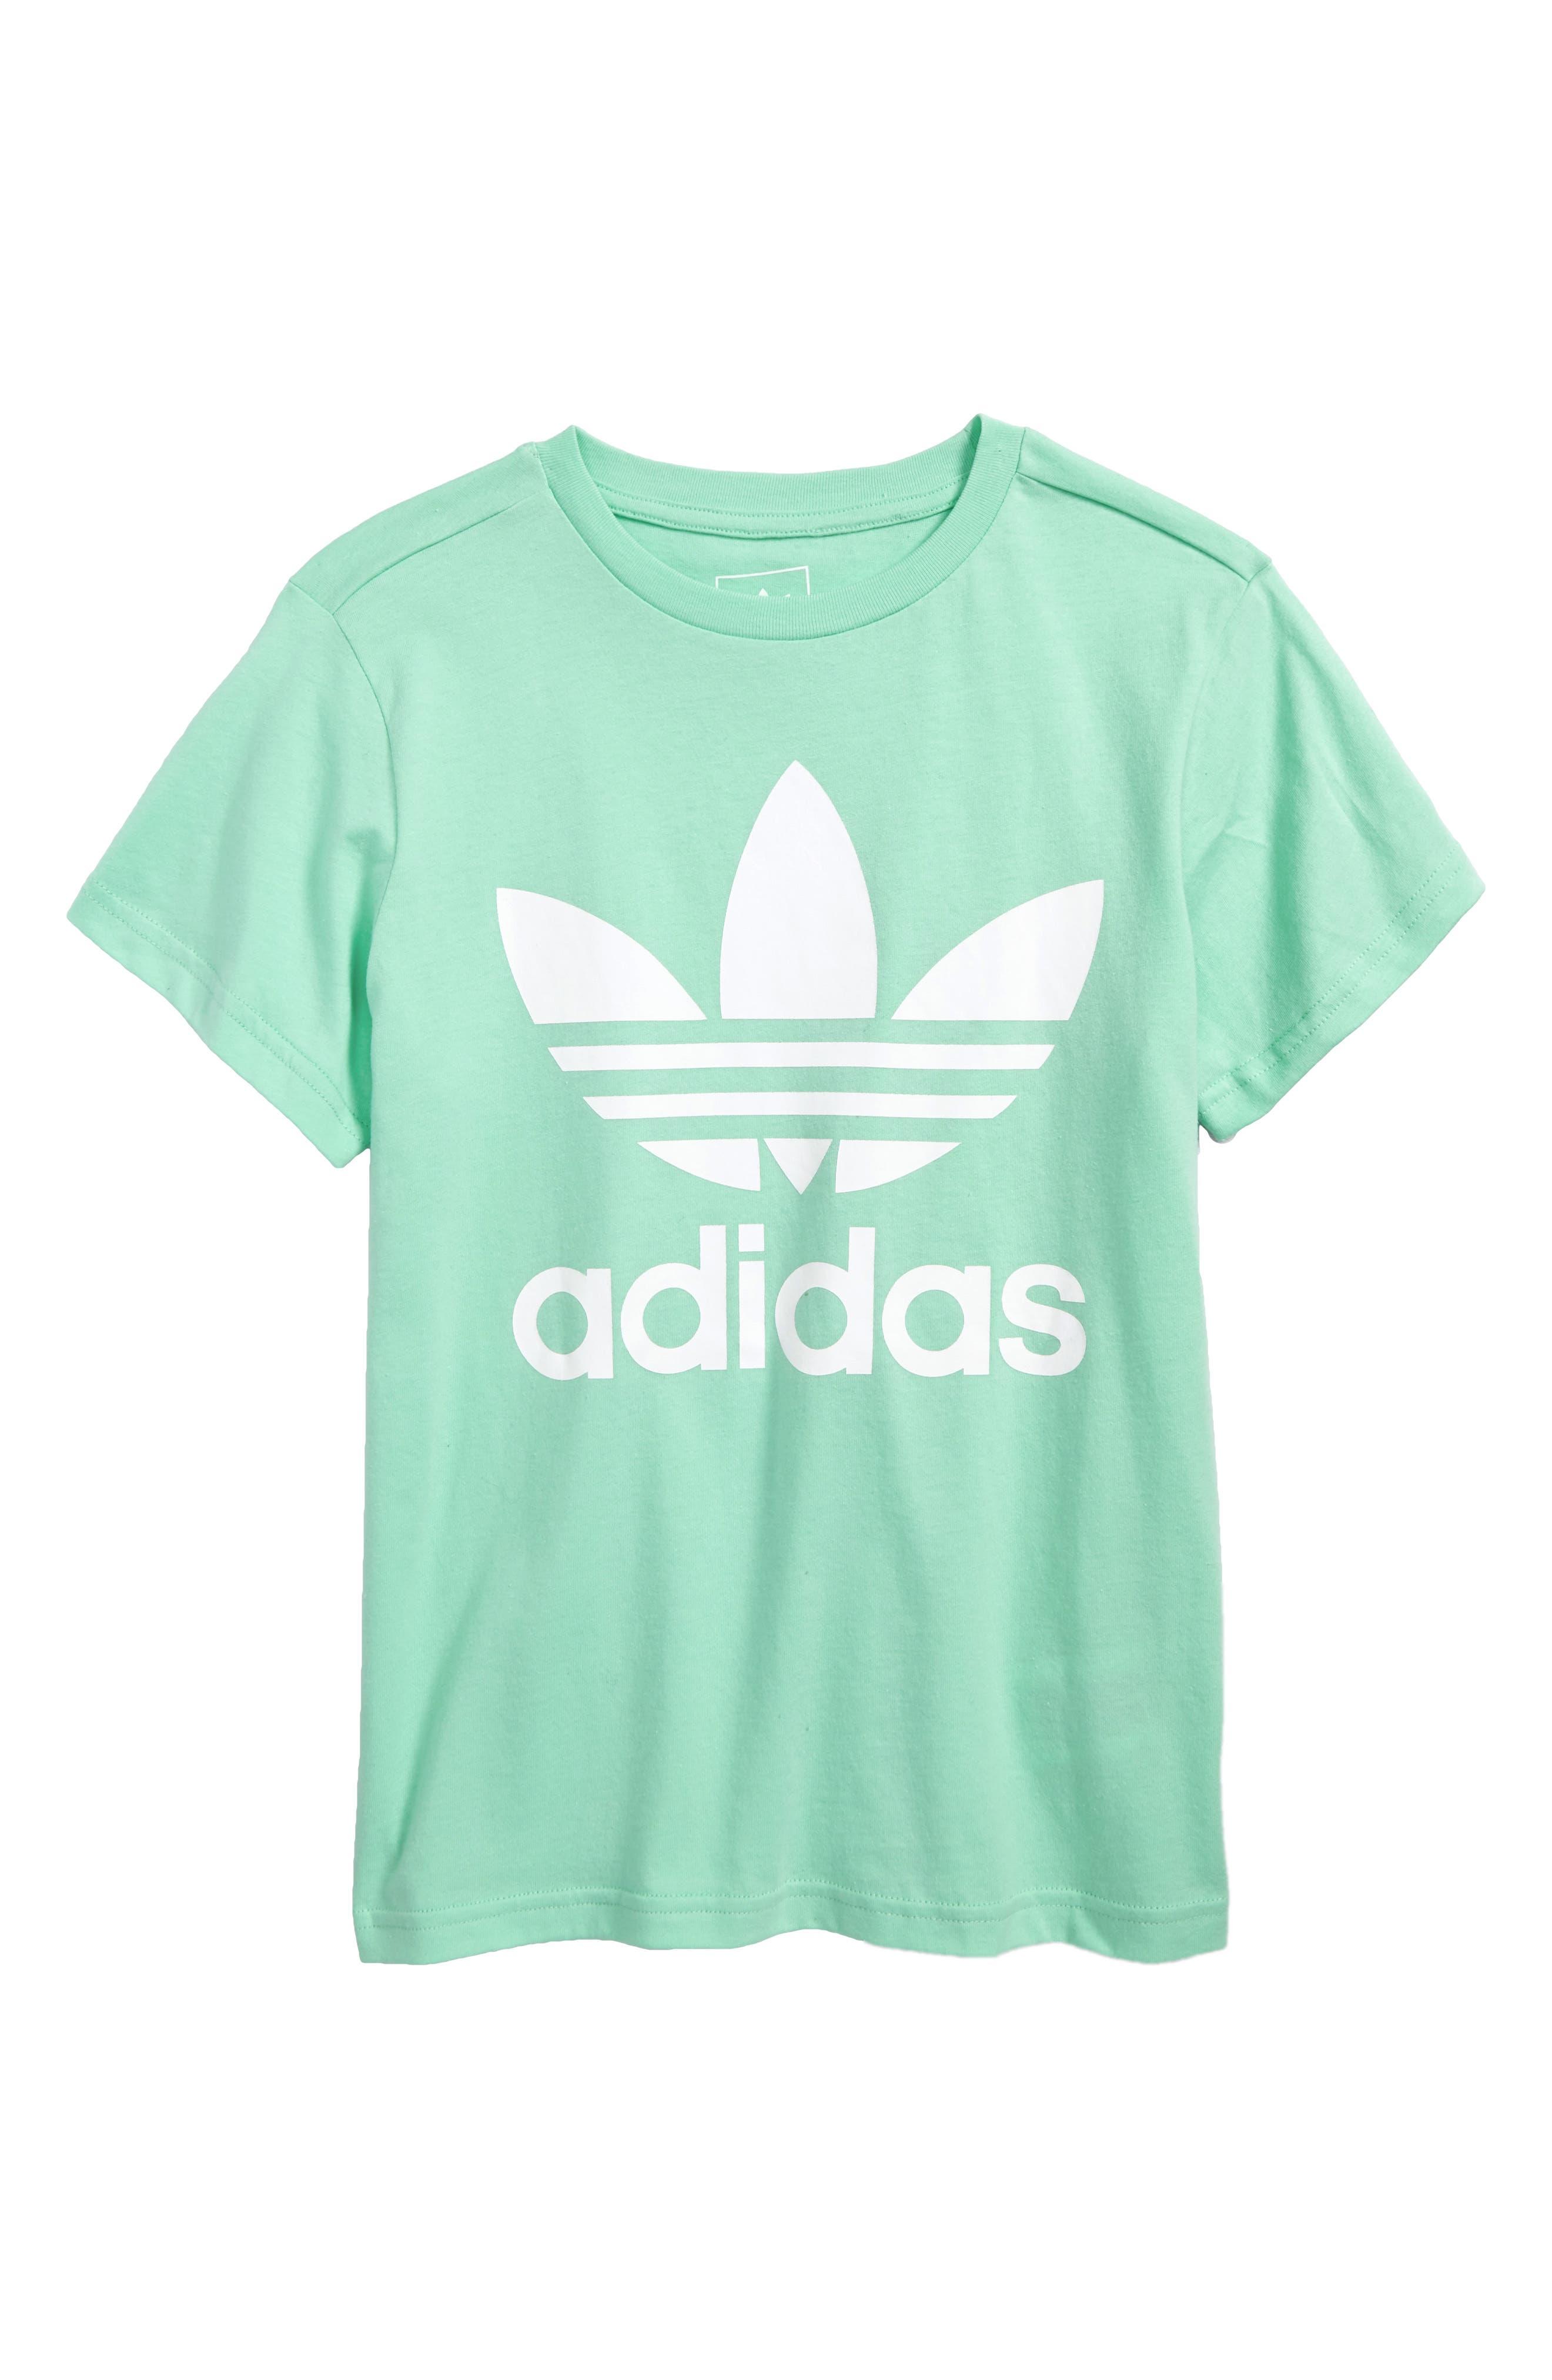 adidas Trefoil Logo Tee,                         Main,                         color, Green